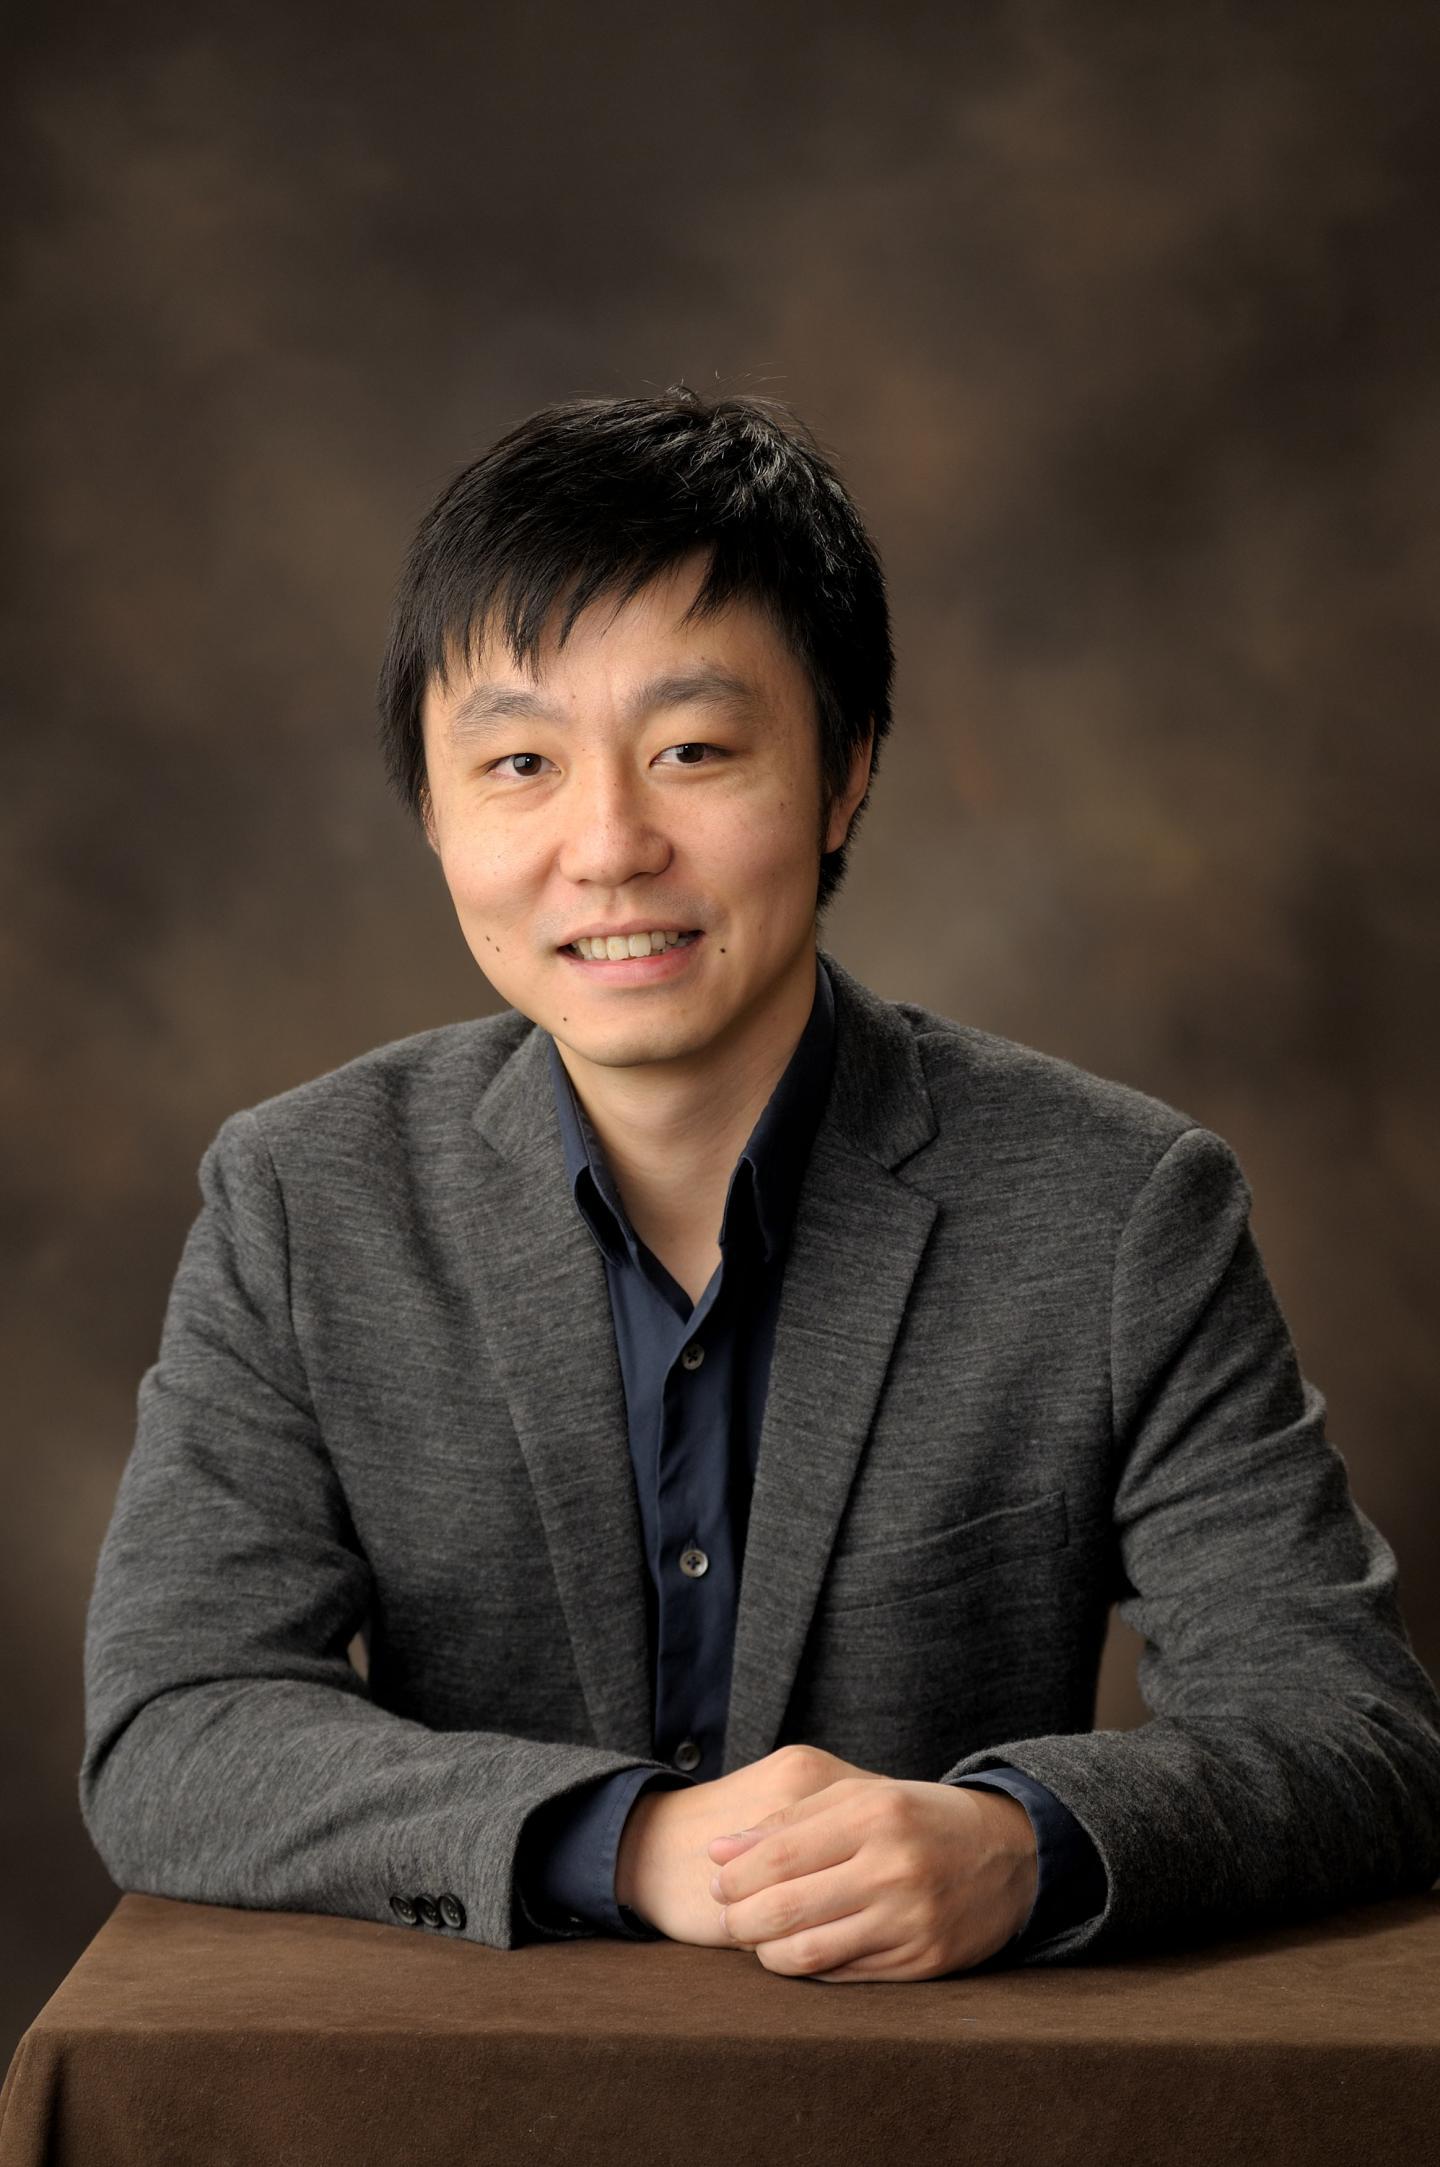 Lei Zhao, University of Illinois